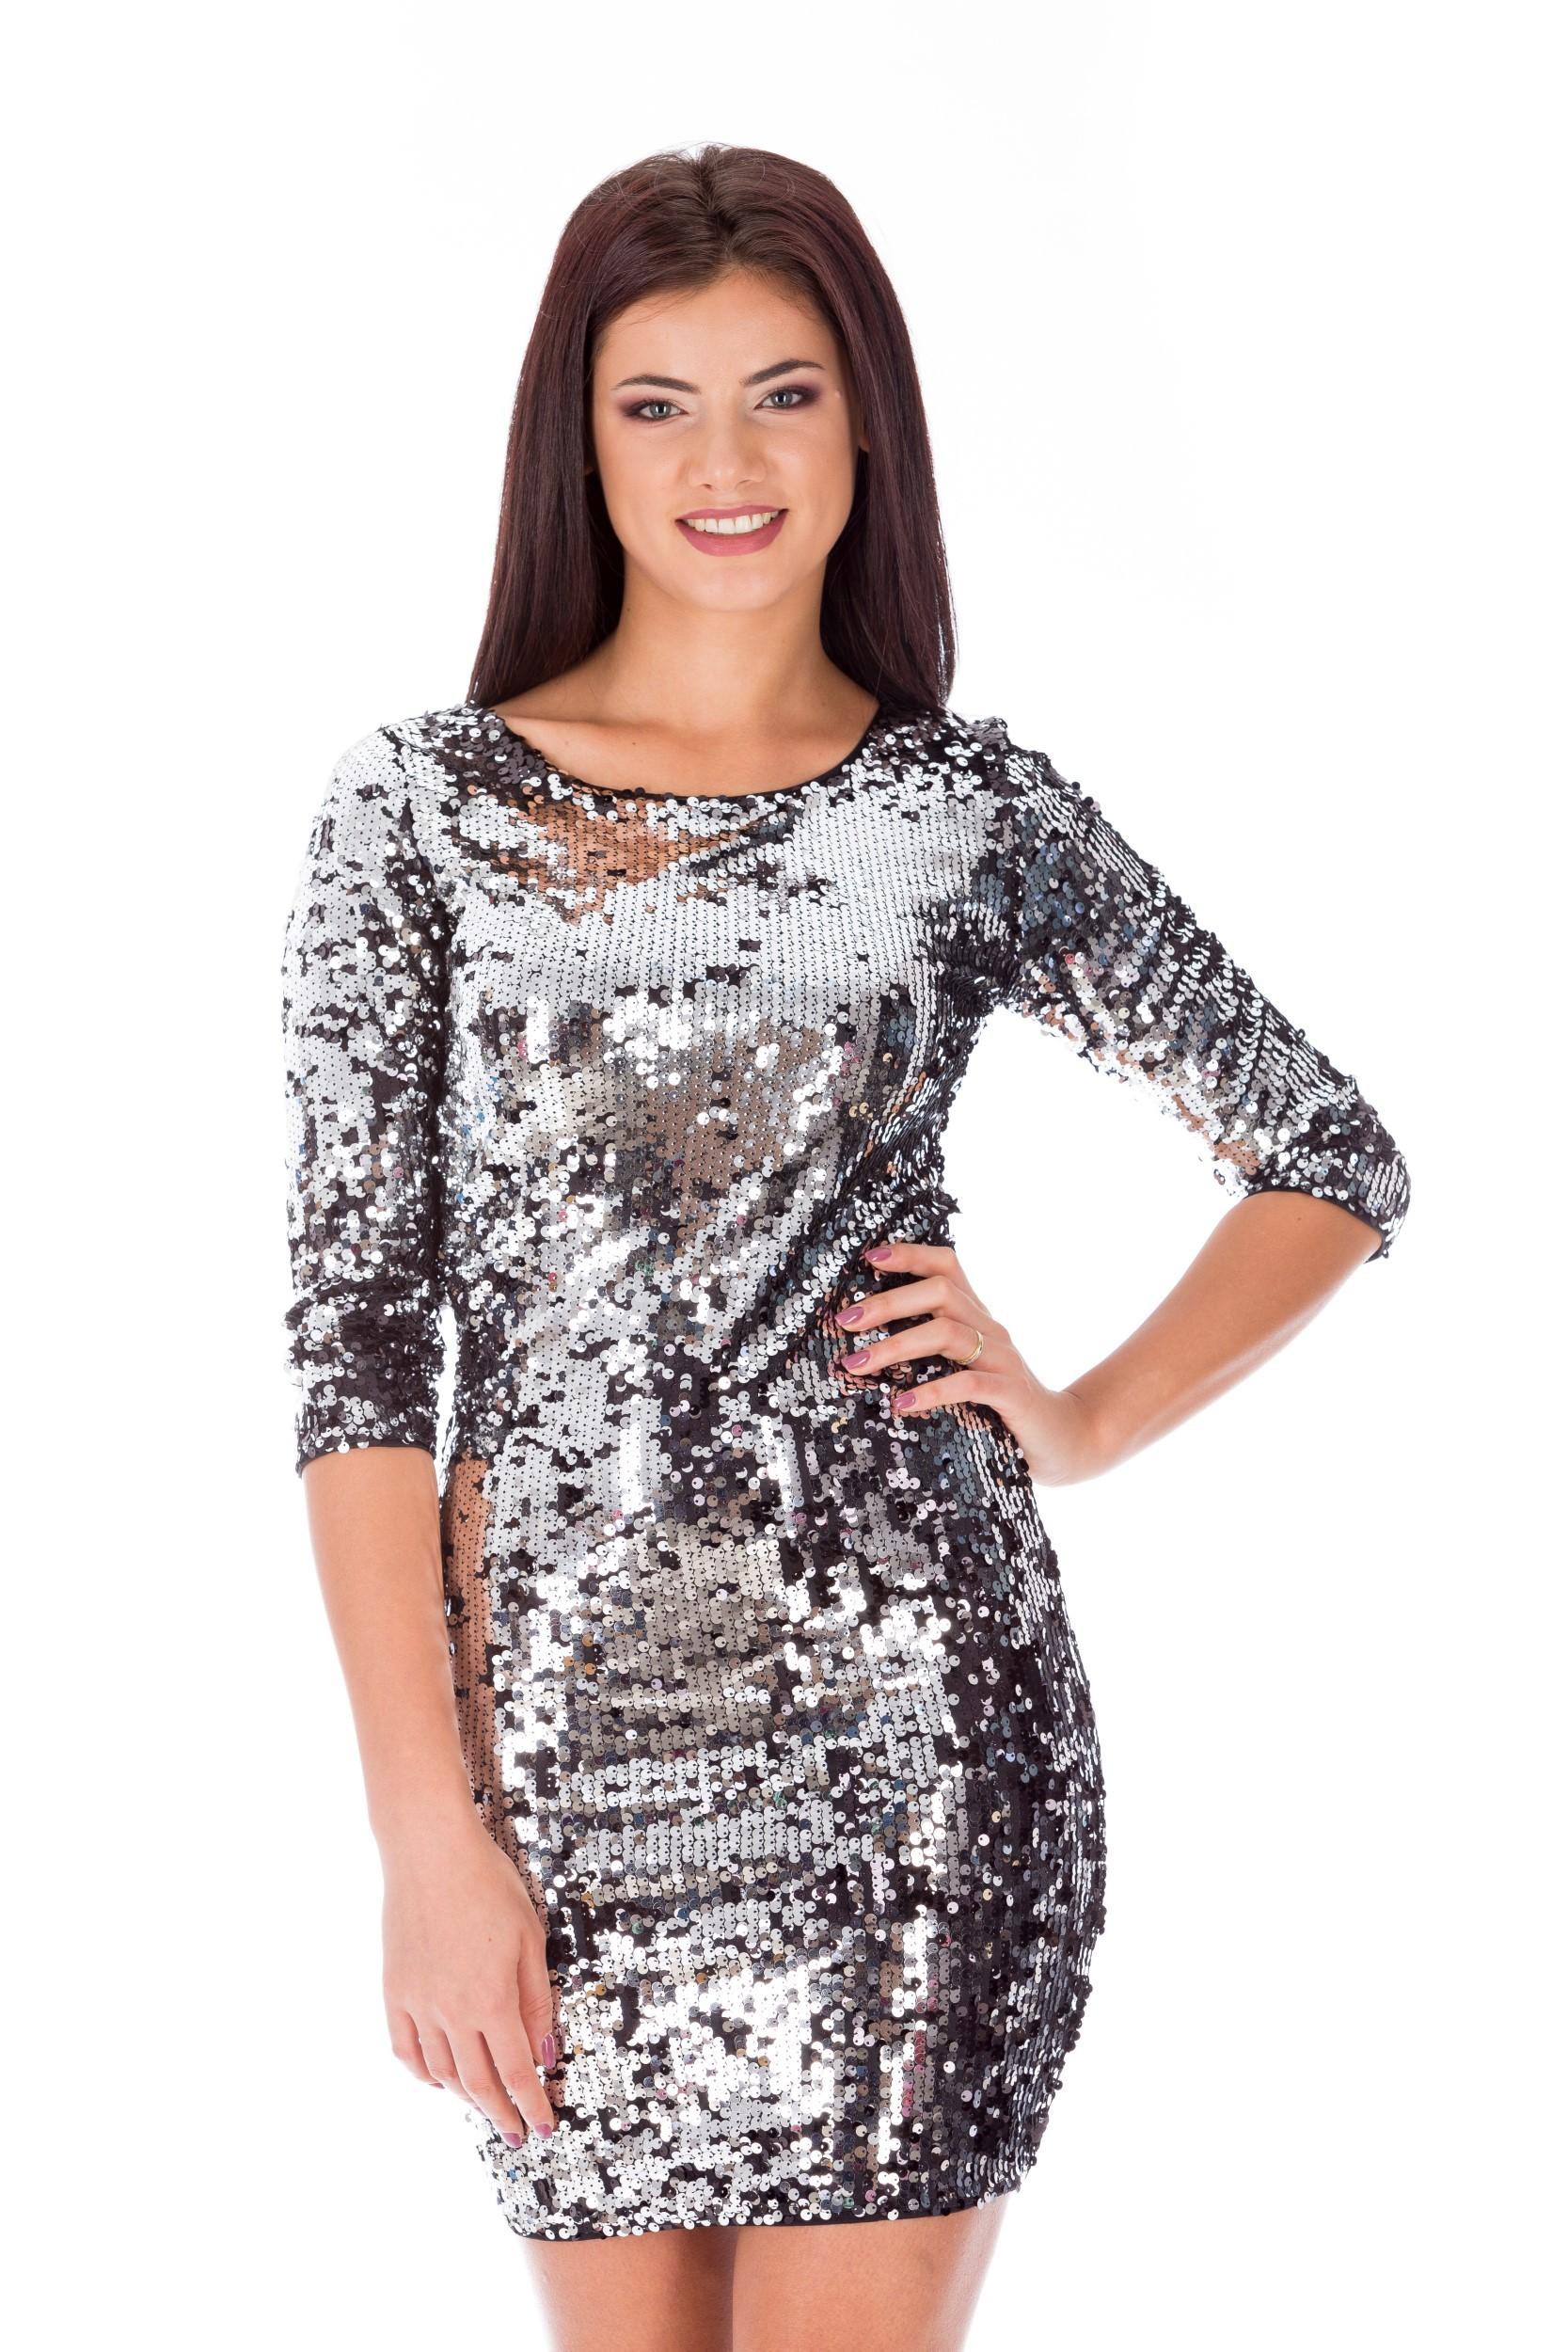 Rochie argintie cu paiete de revelion